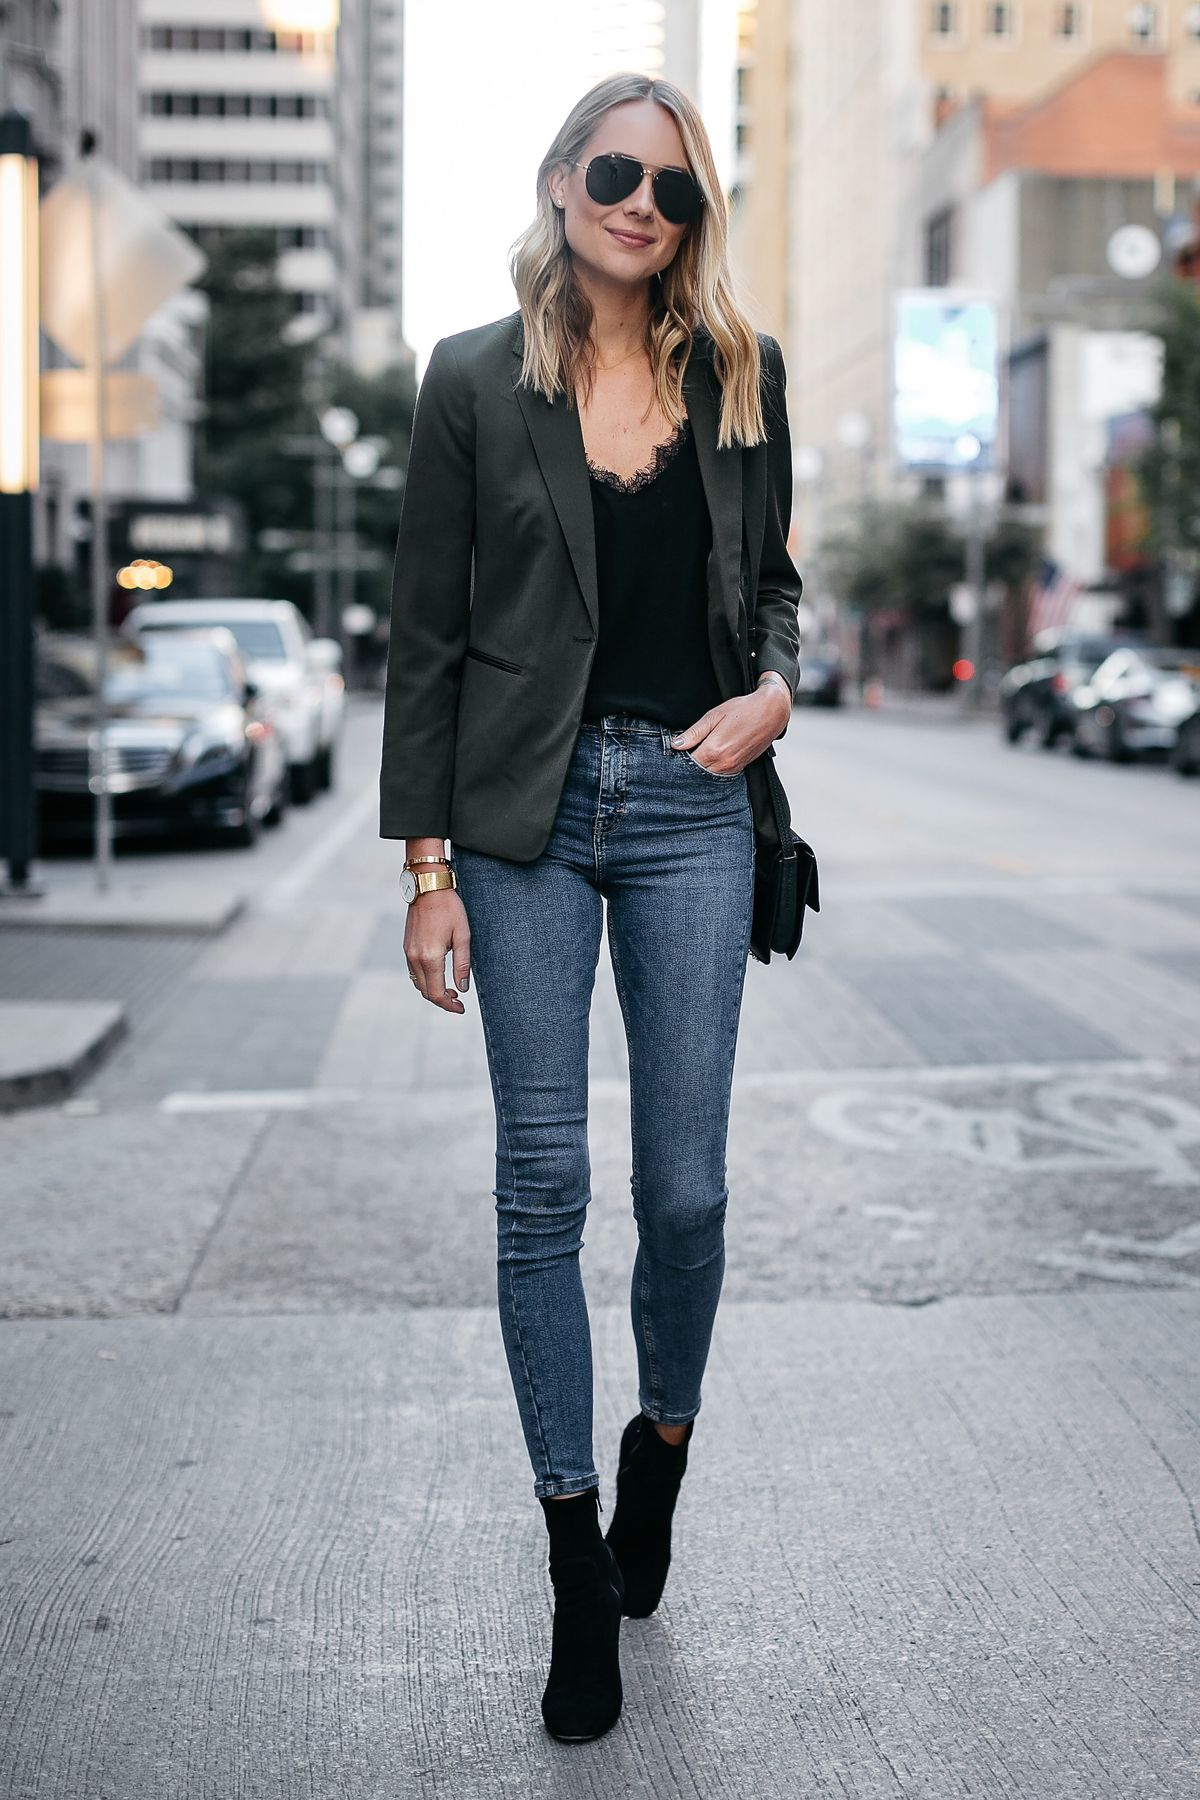 Blonde Woman Wearing Everlane Olive Green Blazer Anine Bing Black Lace Cami  Topshop Denim Skinny Jeans Club Monaco Black Booties Fashion Jackson Dallas  ...